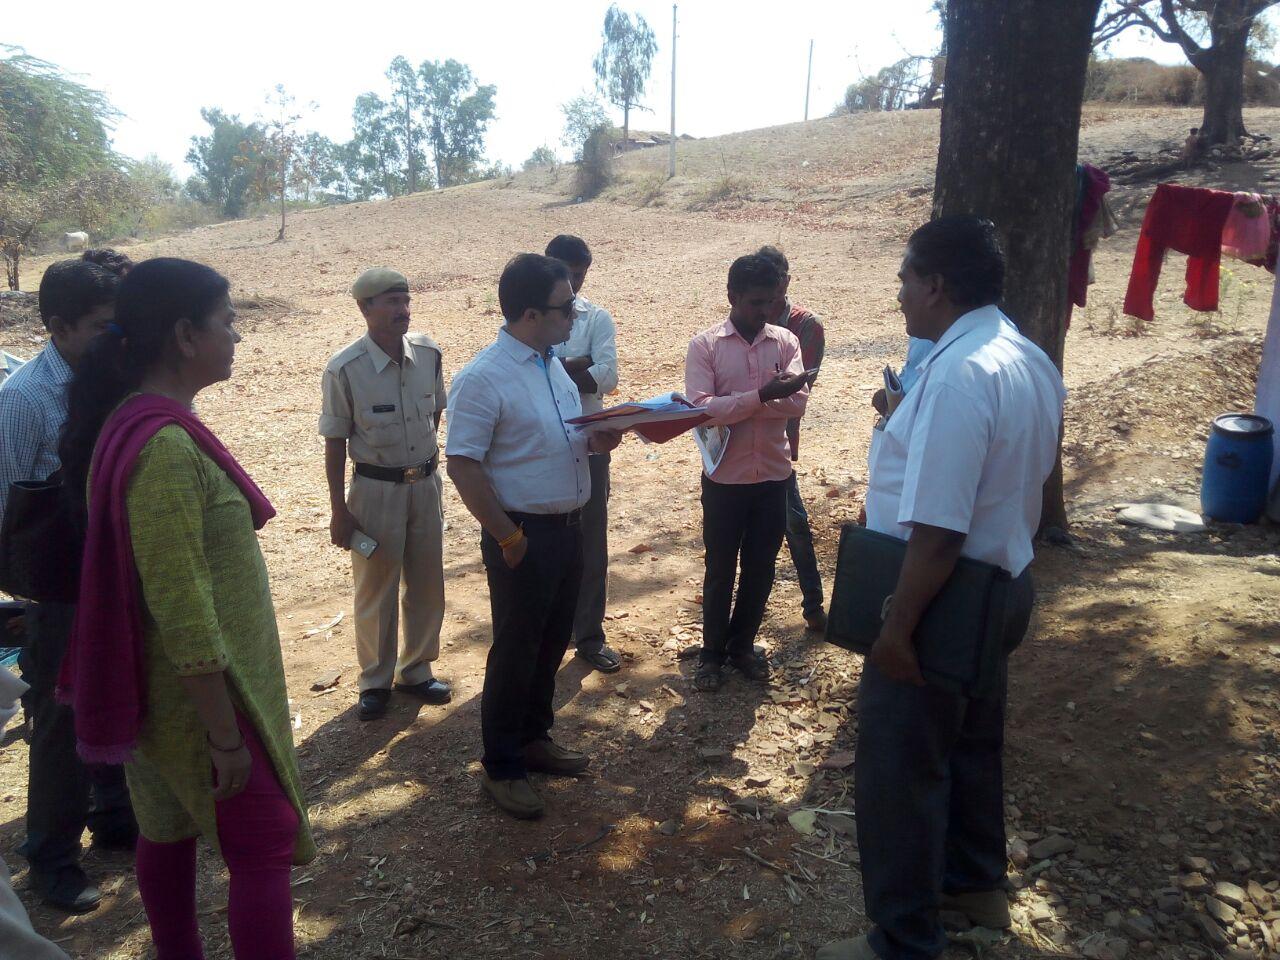 CEO-Zila-Panchayat-visited-the-situation-of-construction-works-Tehsildar-imposed-penalty-सीईओ जिला पंचायत ने भ्रमण कर निर्माण कार्यो की स्थिति देखी, तहसीलदार ने अर्थदण्ड आरोपित किया